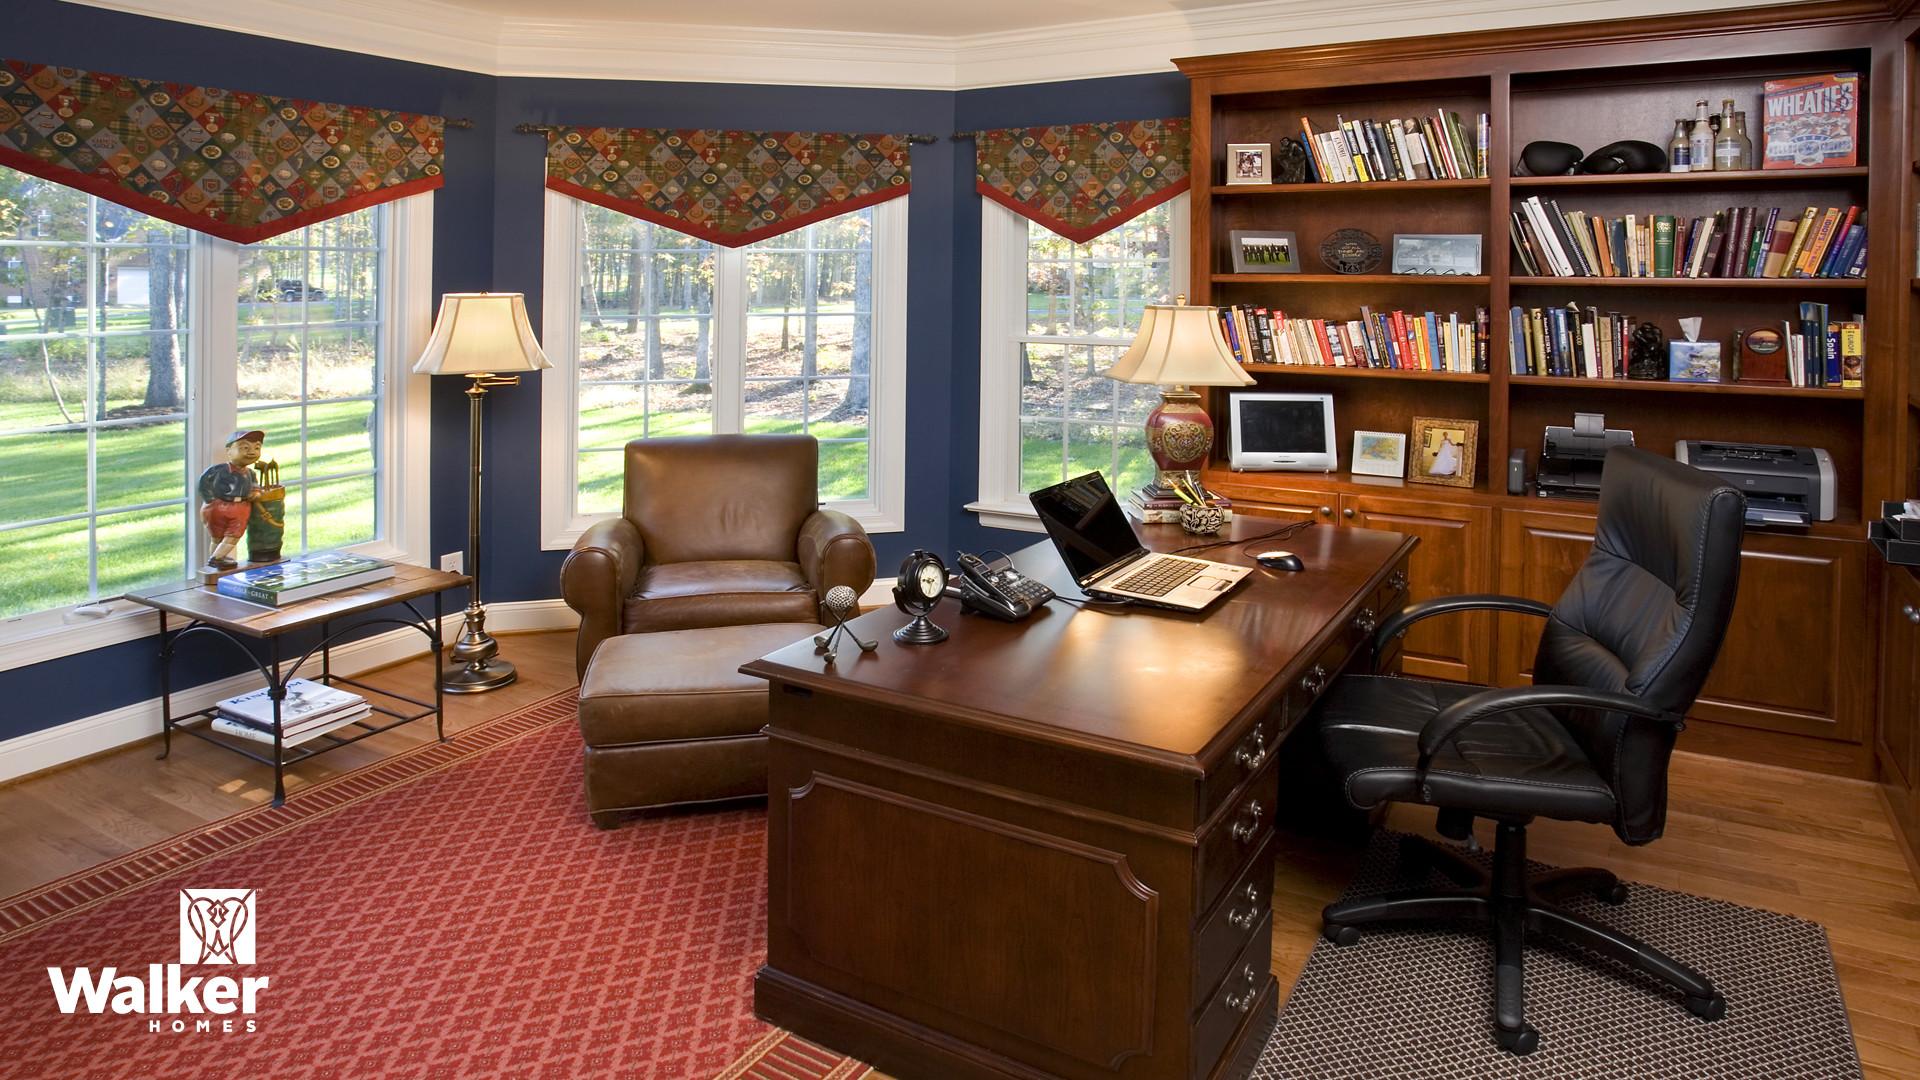 A Home Office from a custom home design by Walker Homes in Glen Allen, Virginia